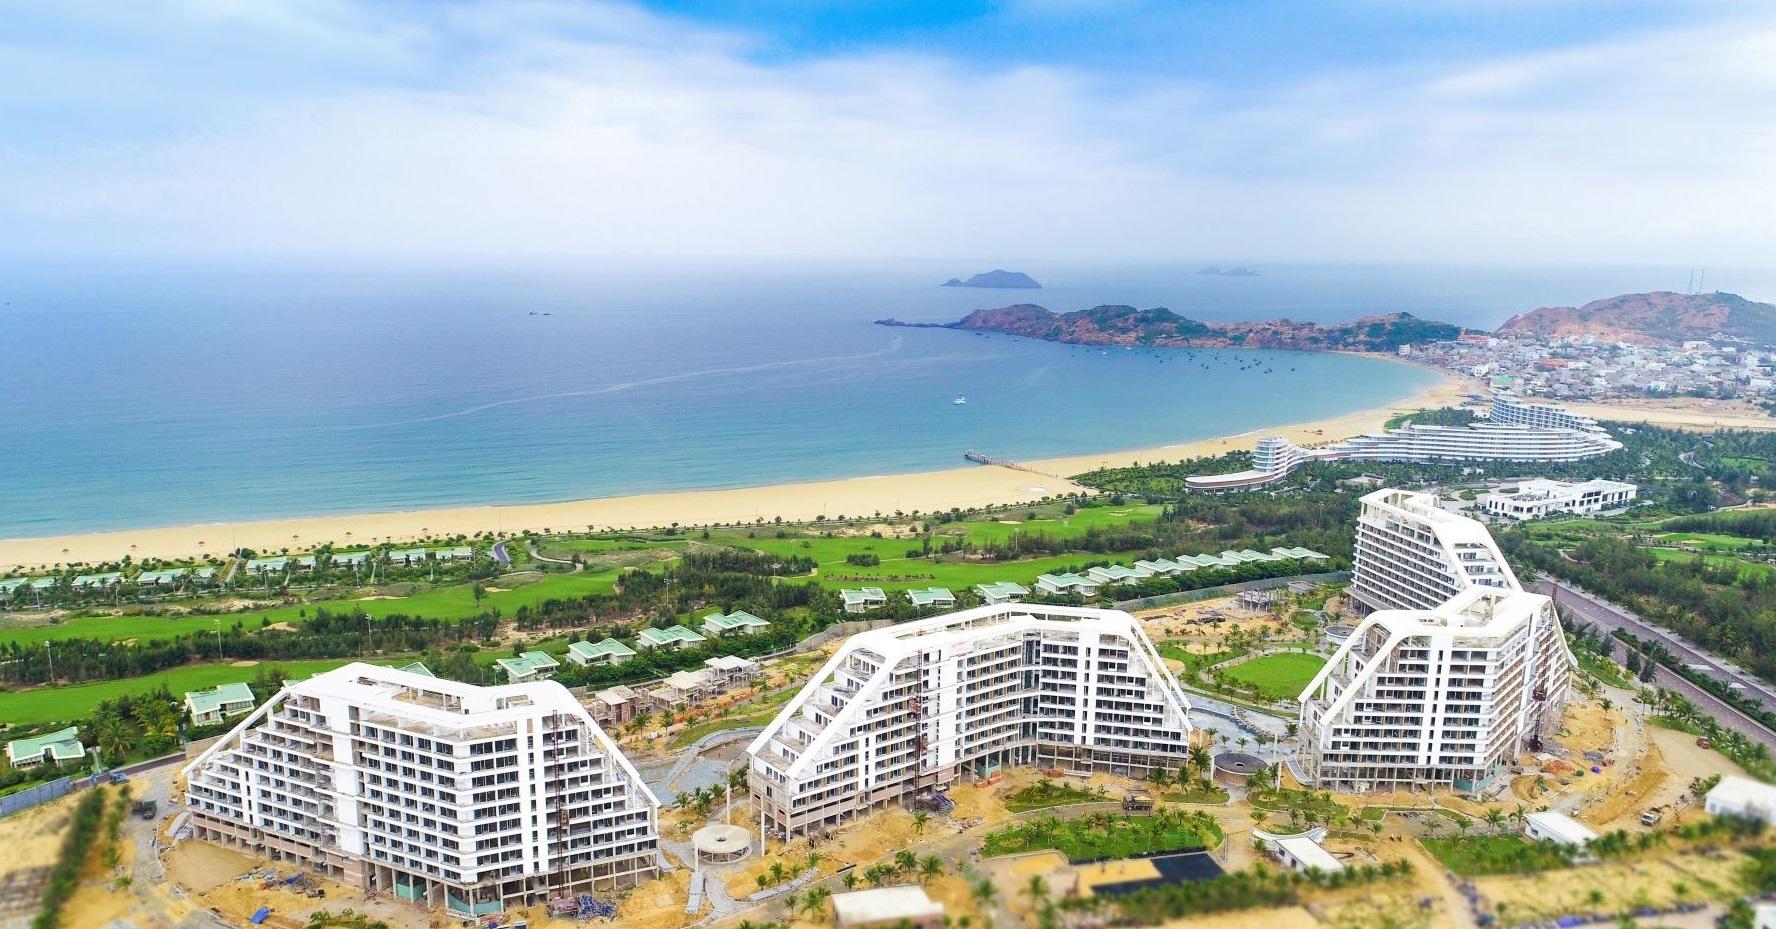 FLC Group to inaugurate Vietnam's biggest hotel in Quy Nhon in November 2020